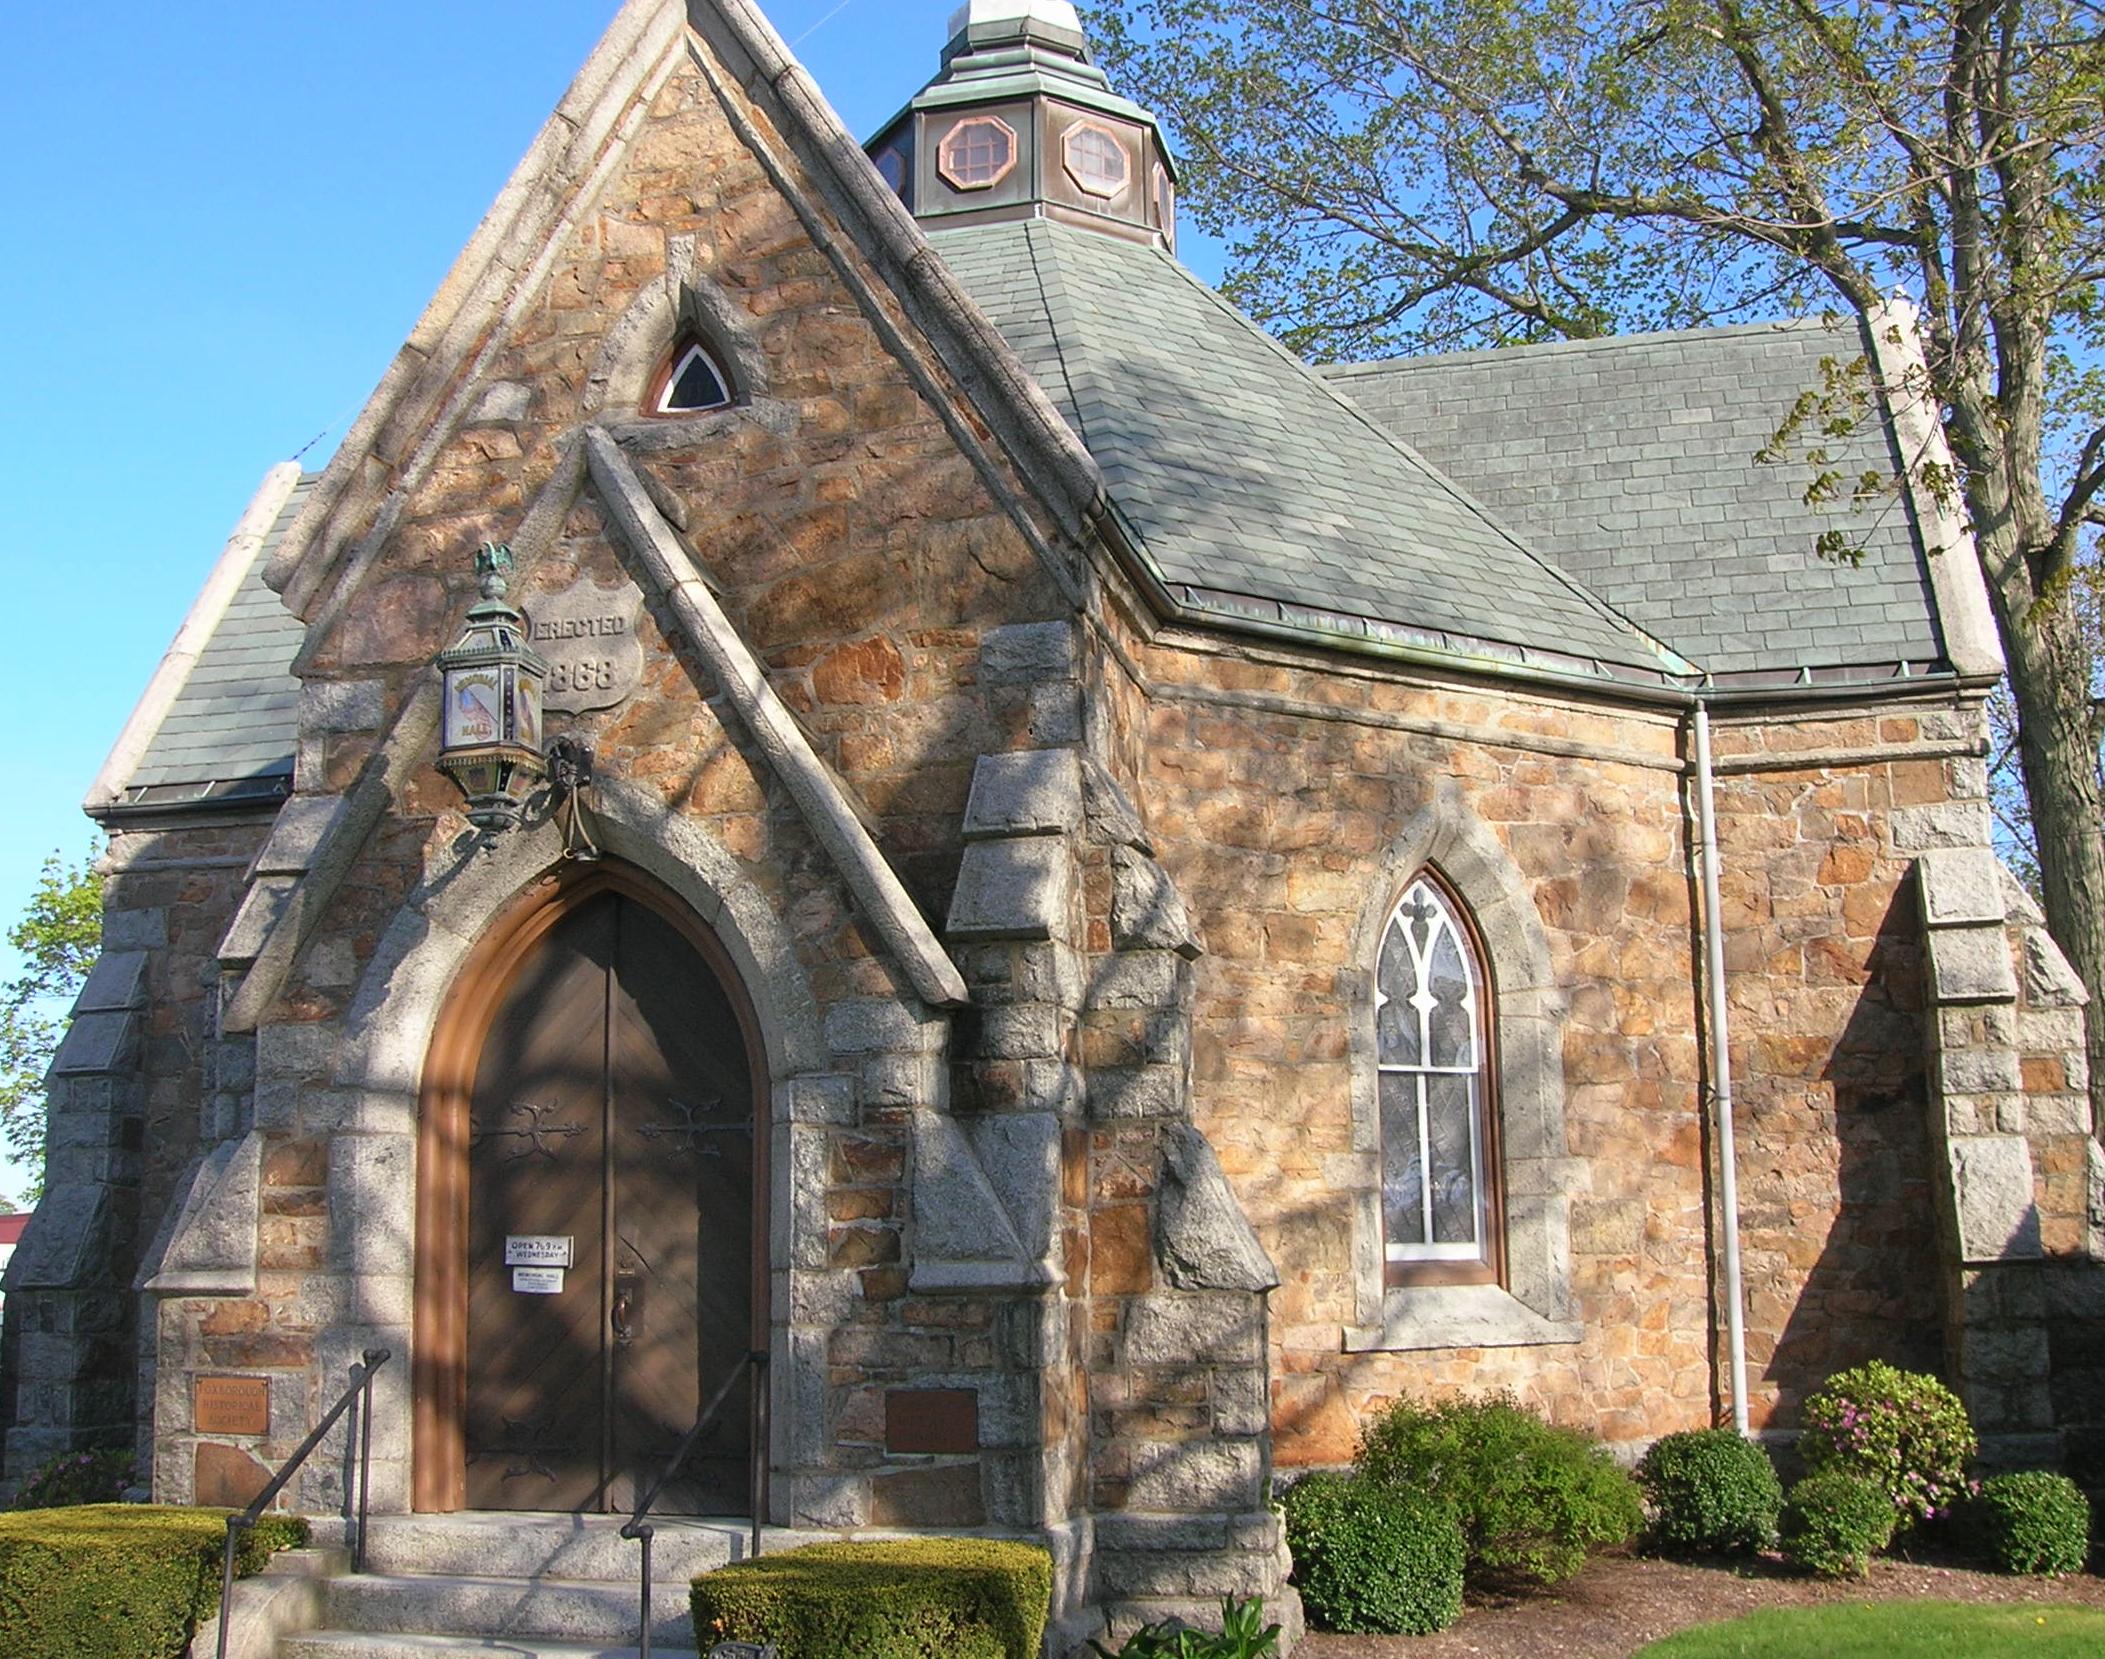 Memorial Hall in Foxborough Massachusetts